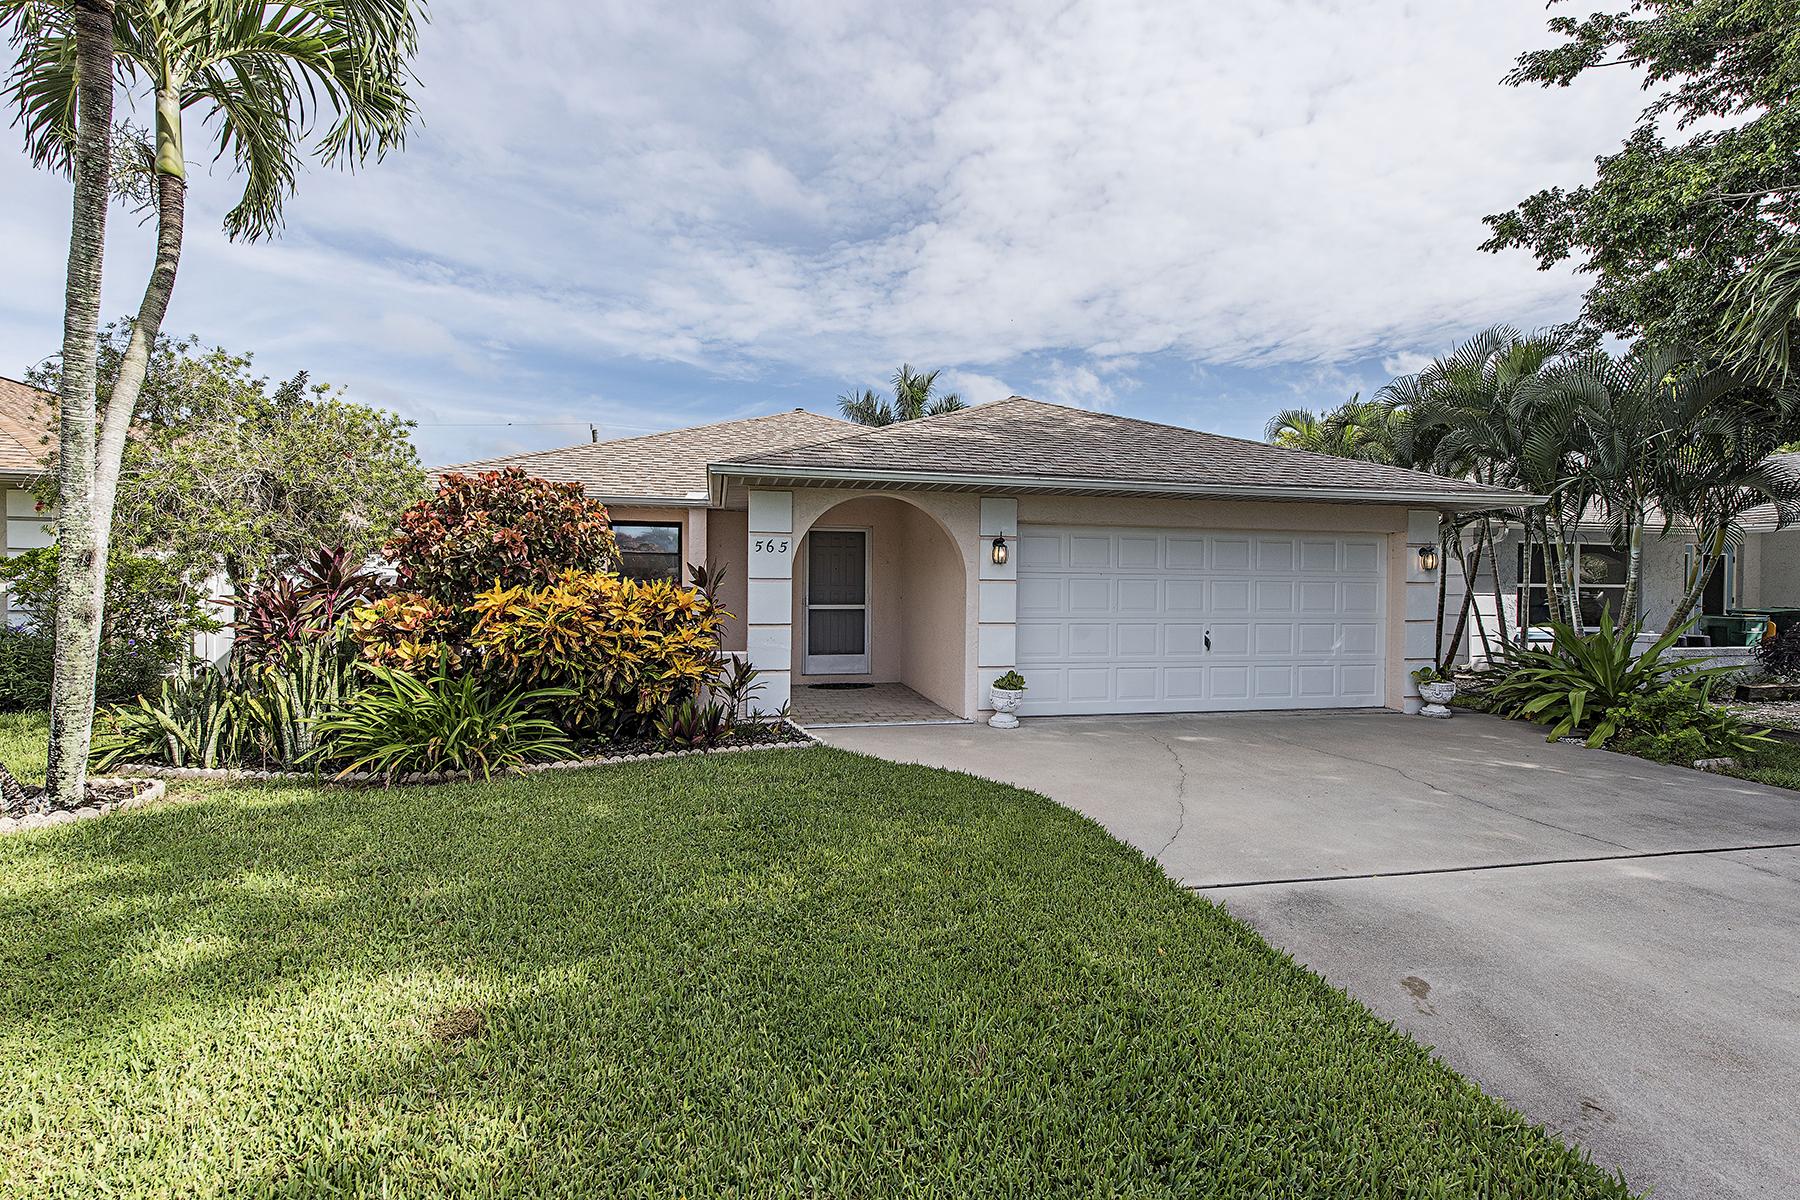 Villa per Vendita alle ore NAPLES PARK 565 108th Ave N Naples, Florida, 34108 Stati Uniti